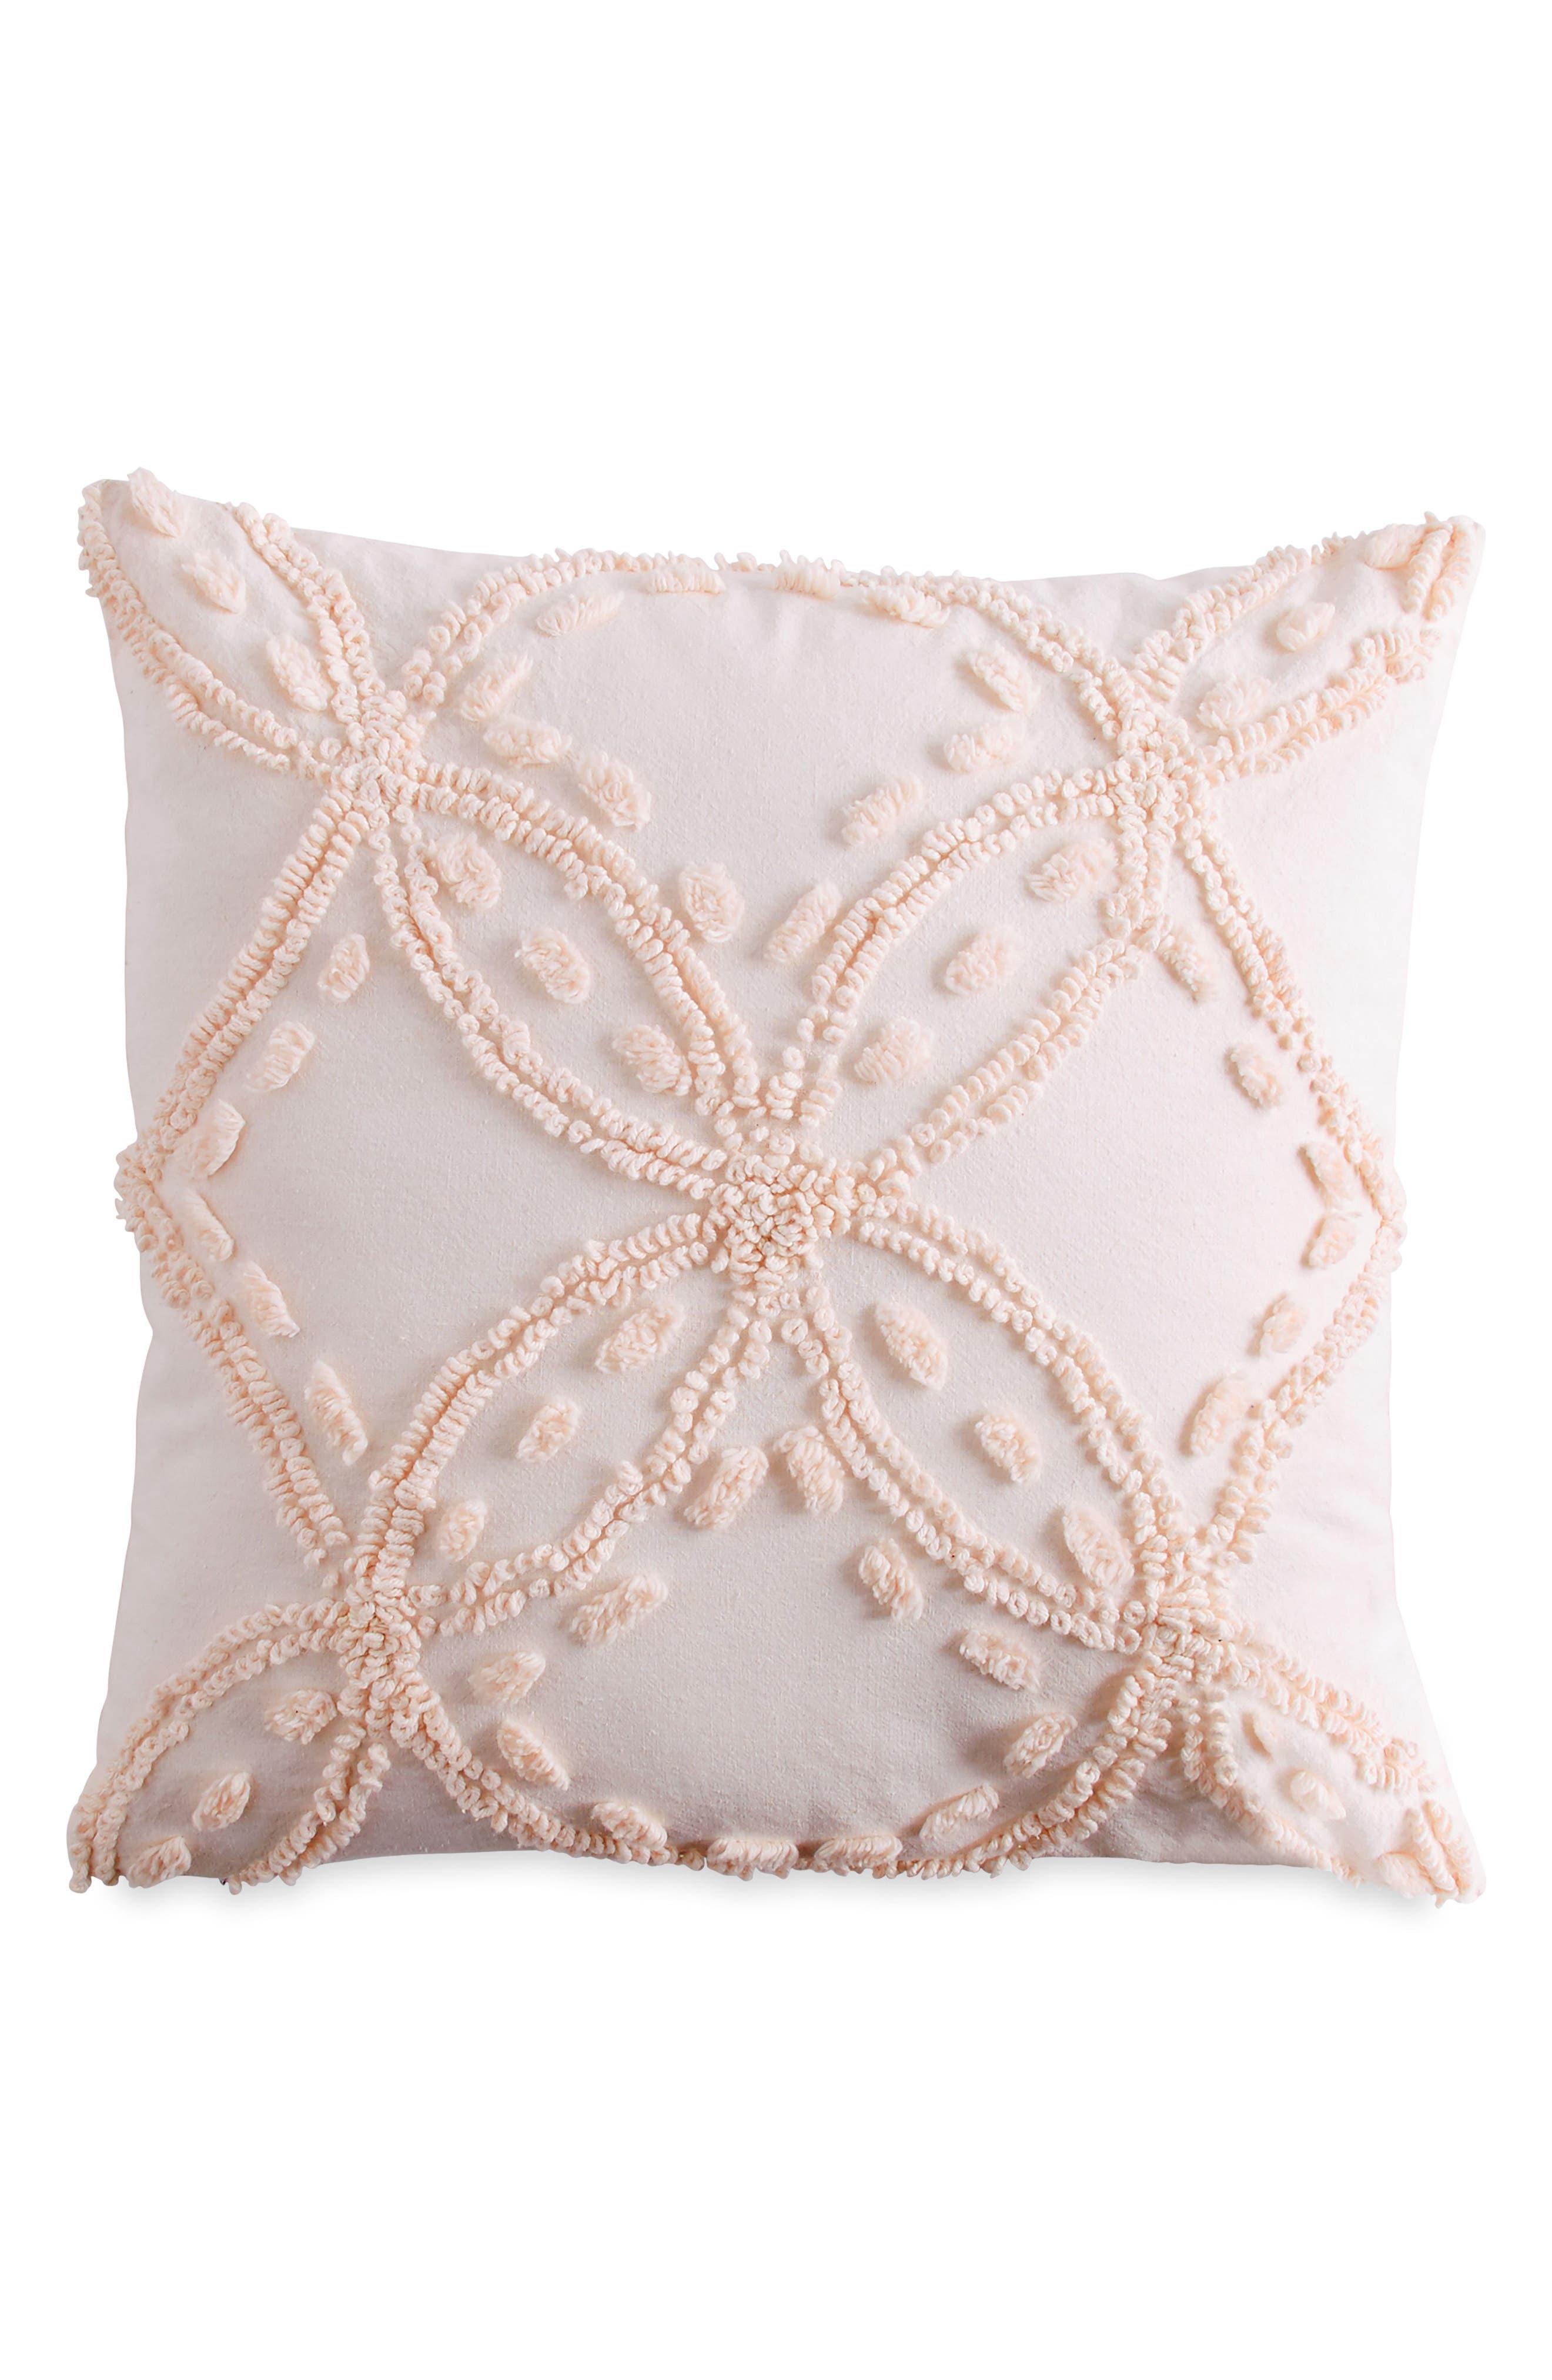 Chenille Pillow,                         Main,                         color, Blush